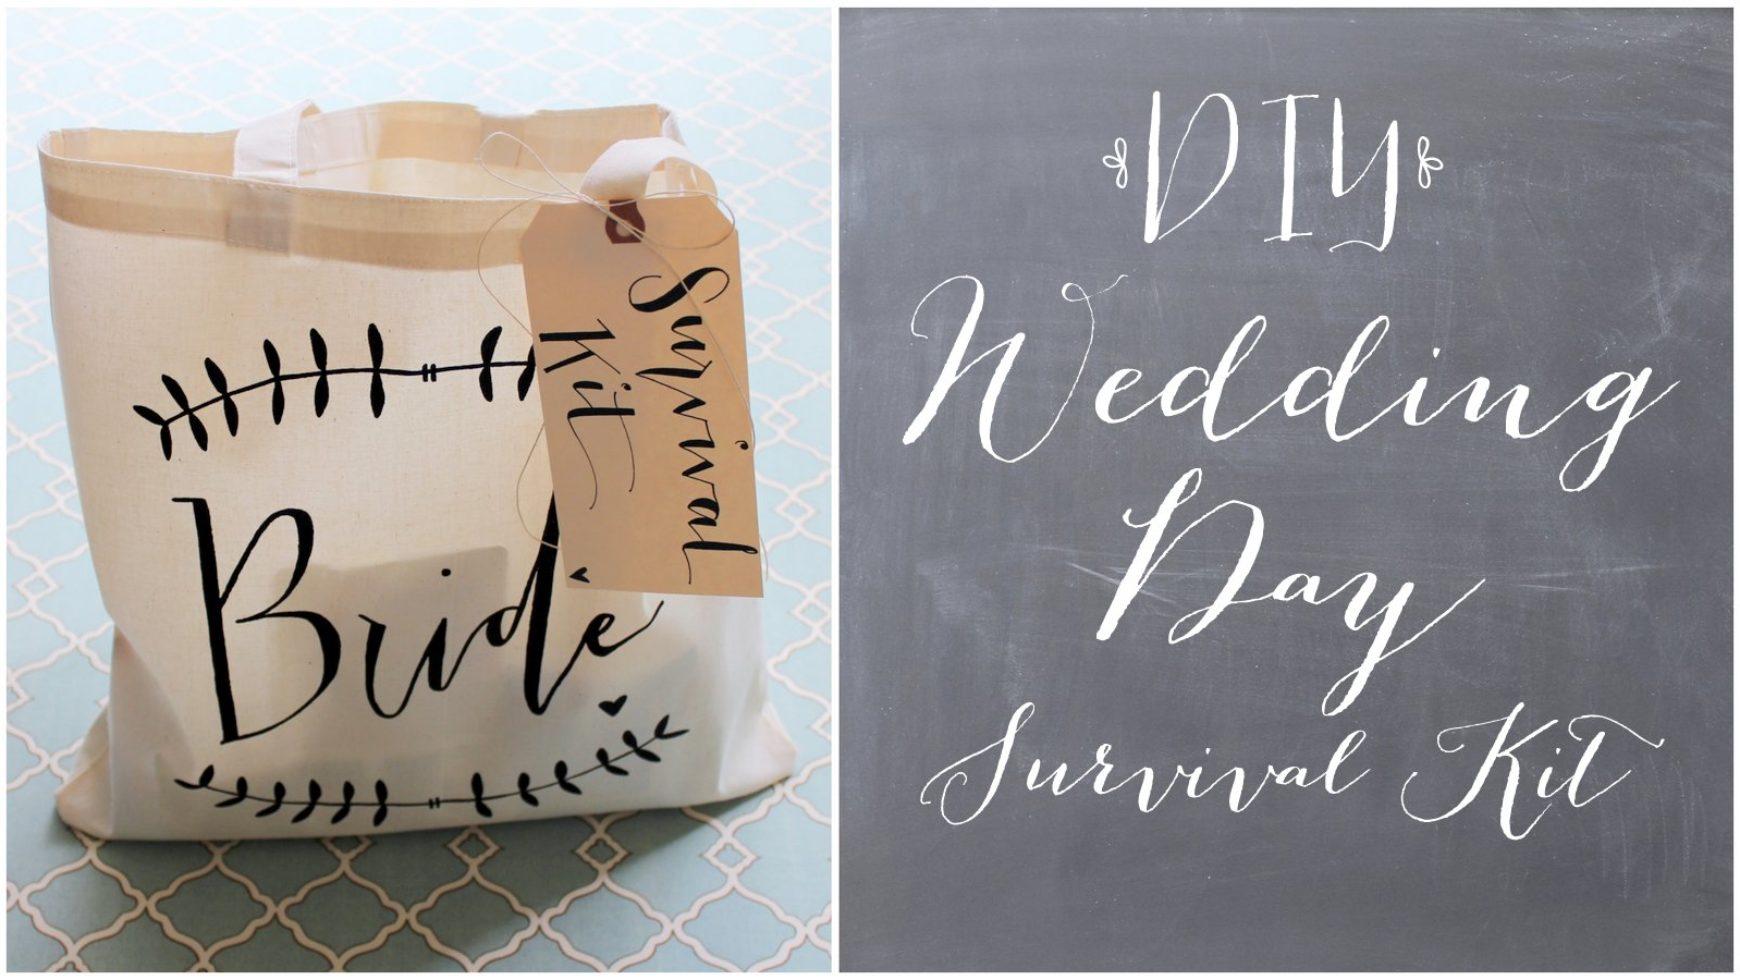 Every Bride Wedding Survival Kit